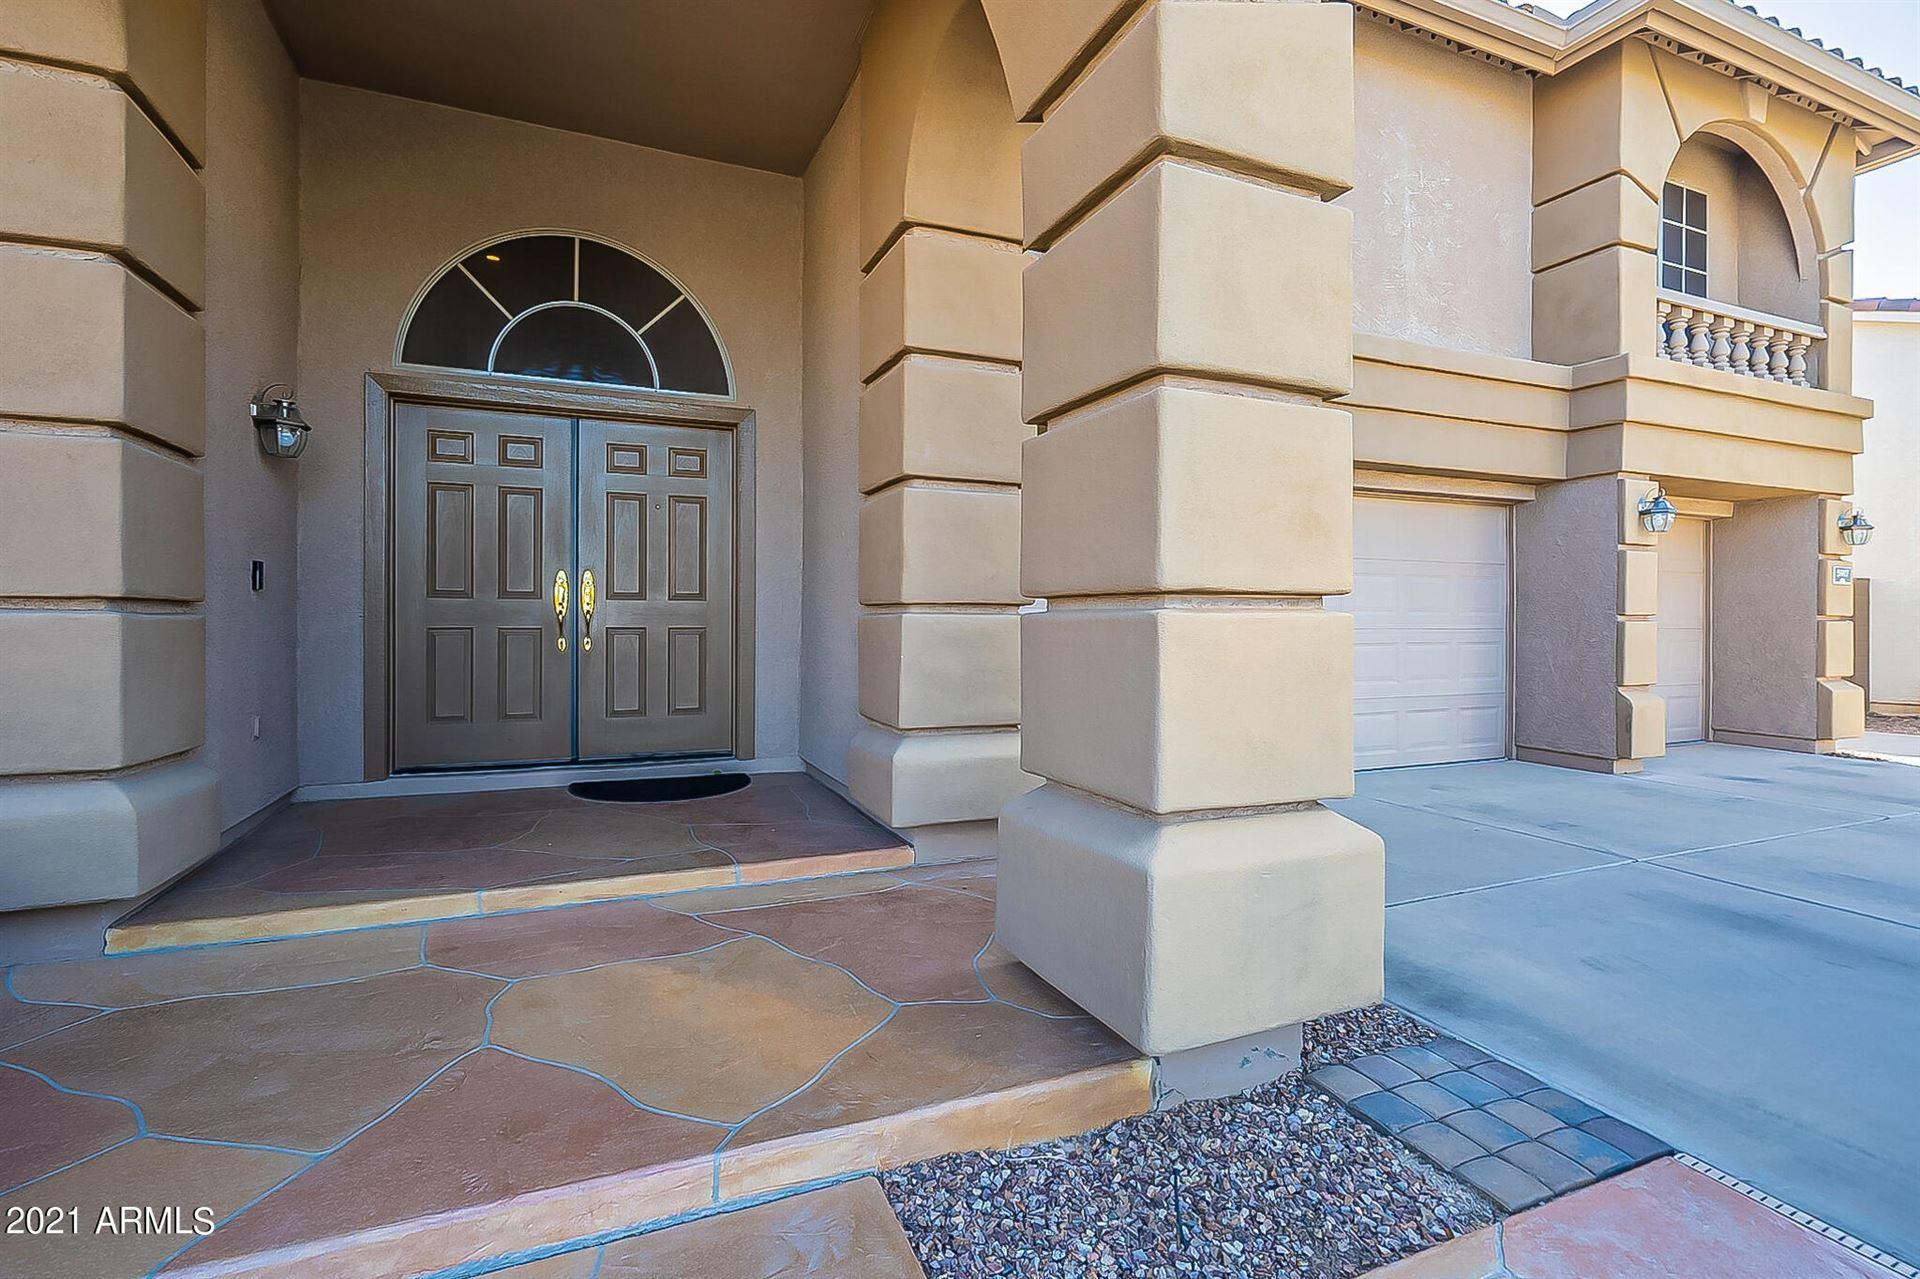 Photo of 5917 N 133RD Avenue, Litchfield Park, AZ 85340 (MLS # 6306749)